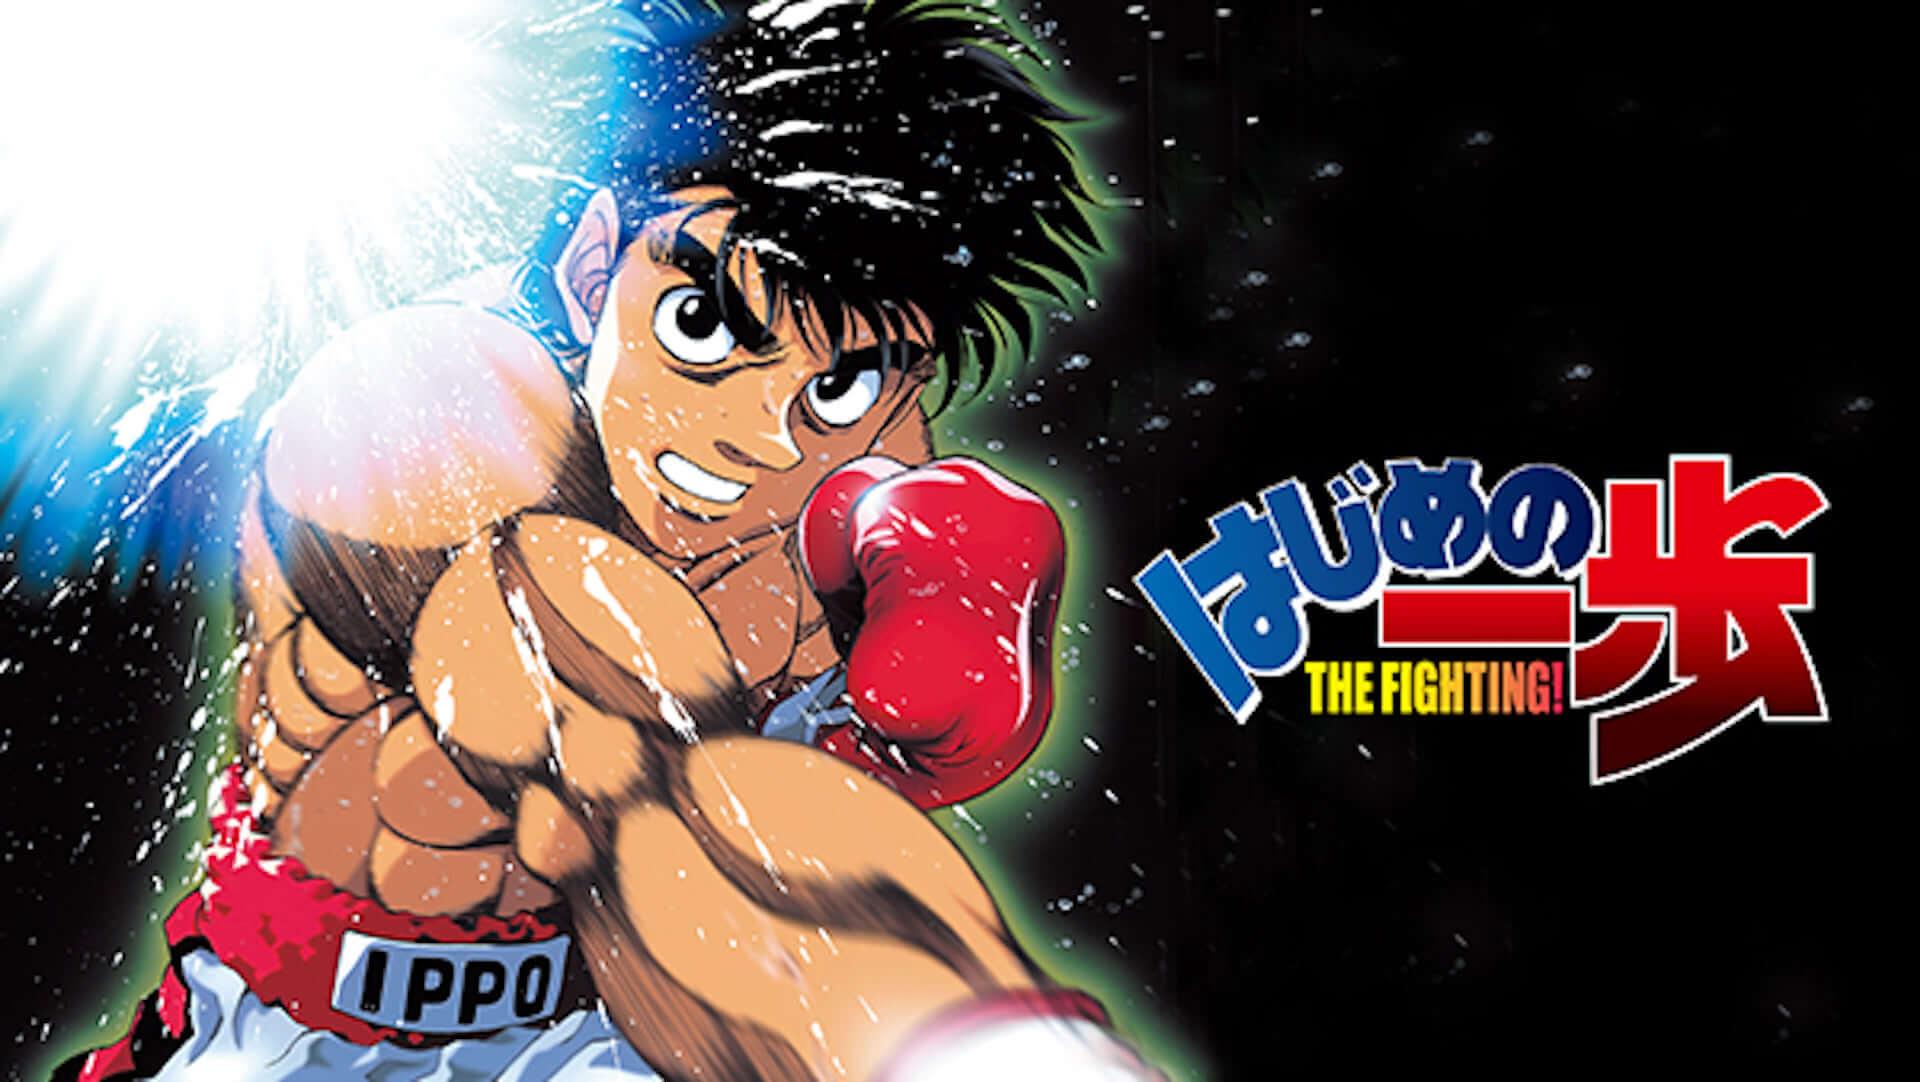 Huluの人気アニメ38作品が無料配信開始!『HUNTER×HUNTER』『ちはやふる』『デスノート』『宇宙兄弟』『はじめの一歩』も見放題 art200417_hulu_anime_4-1920x1082